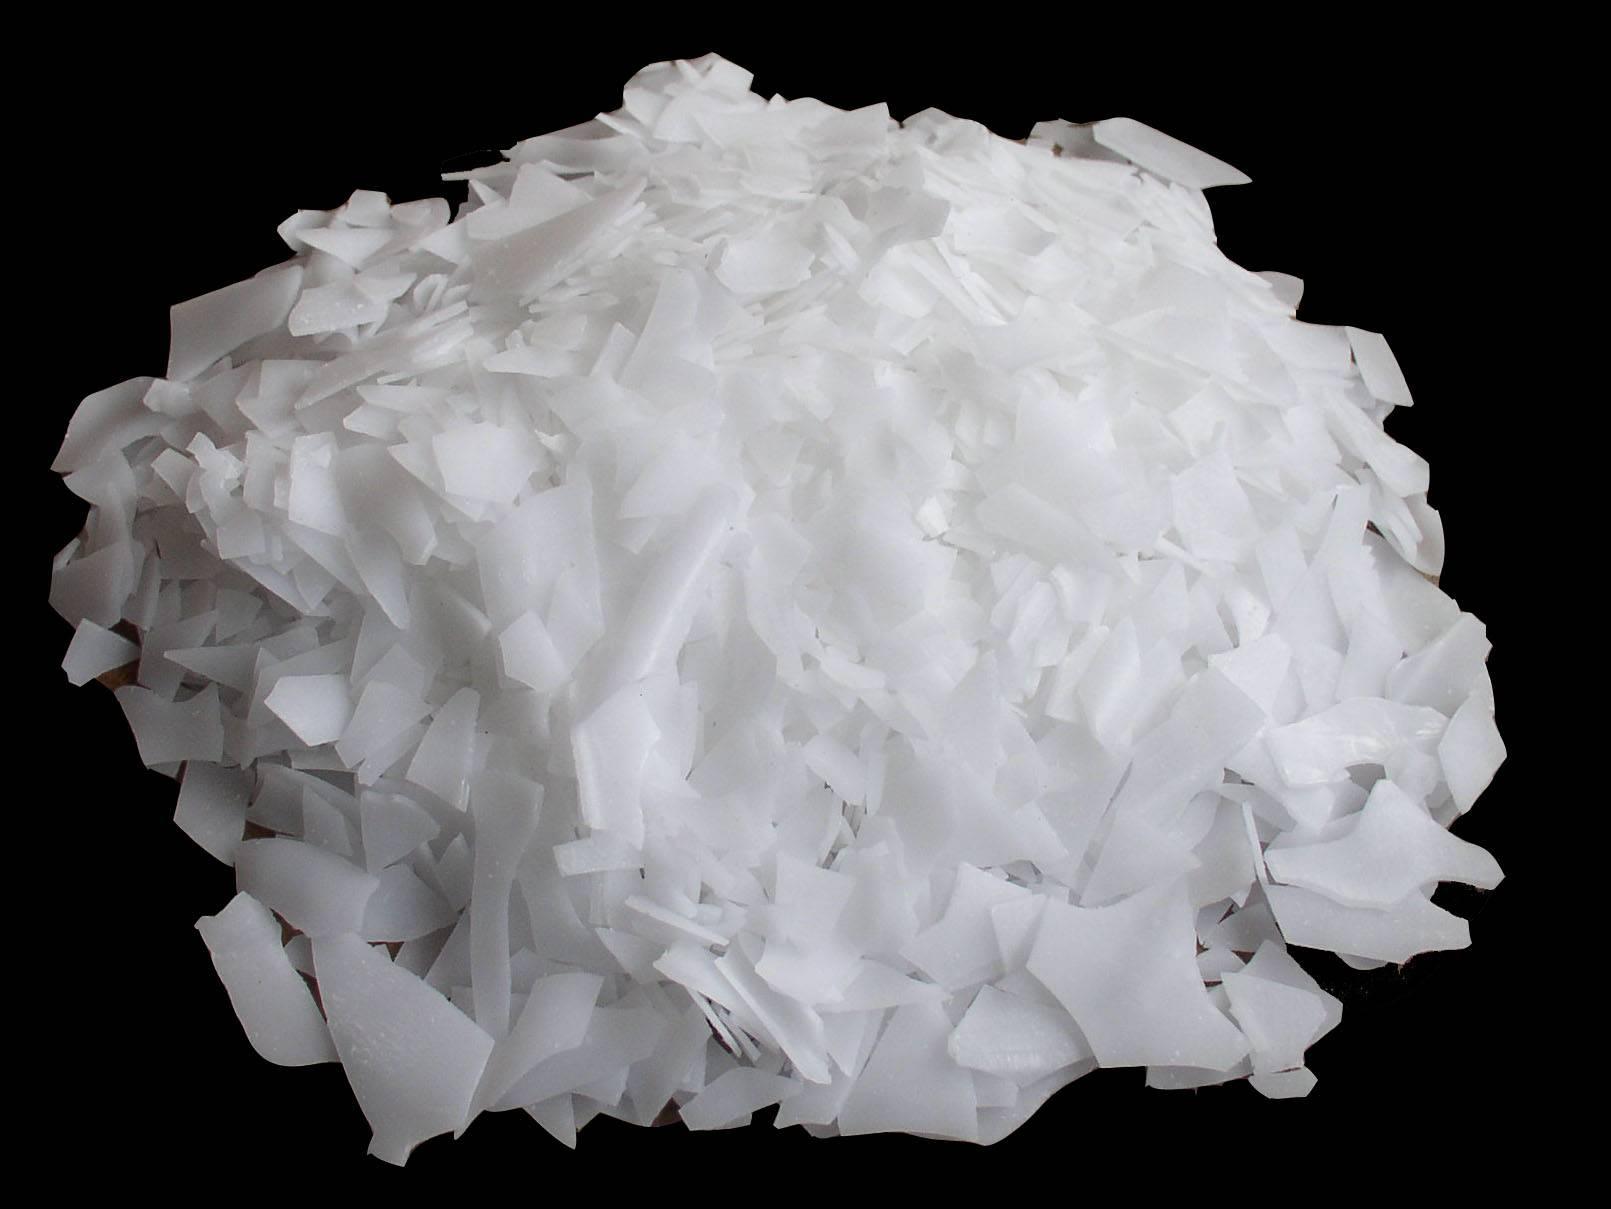 Polyethylene Wax for Hot Melt Adhesive